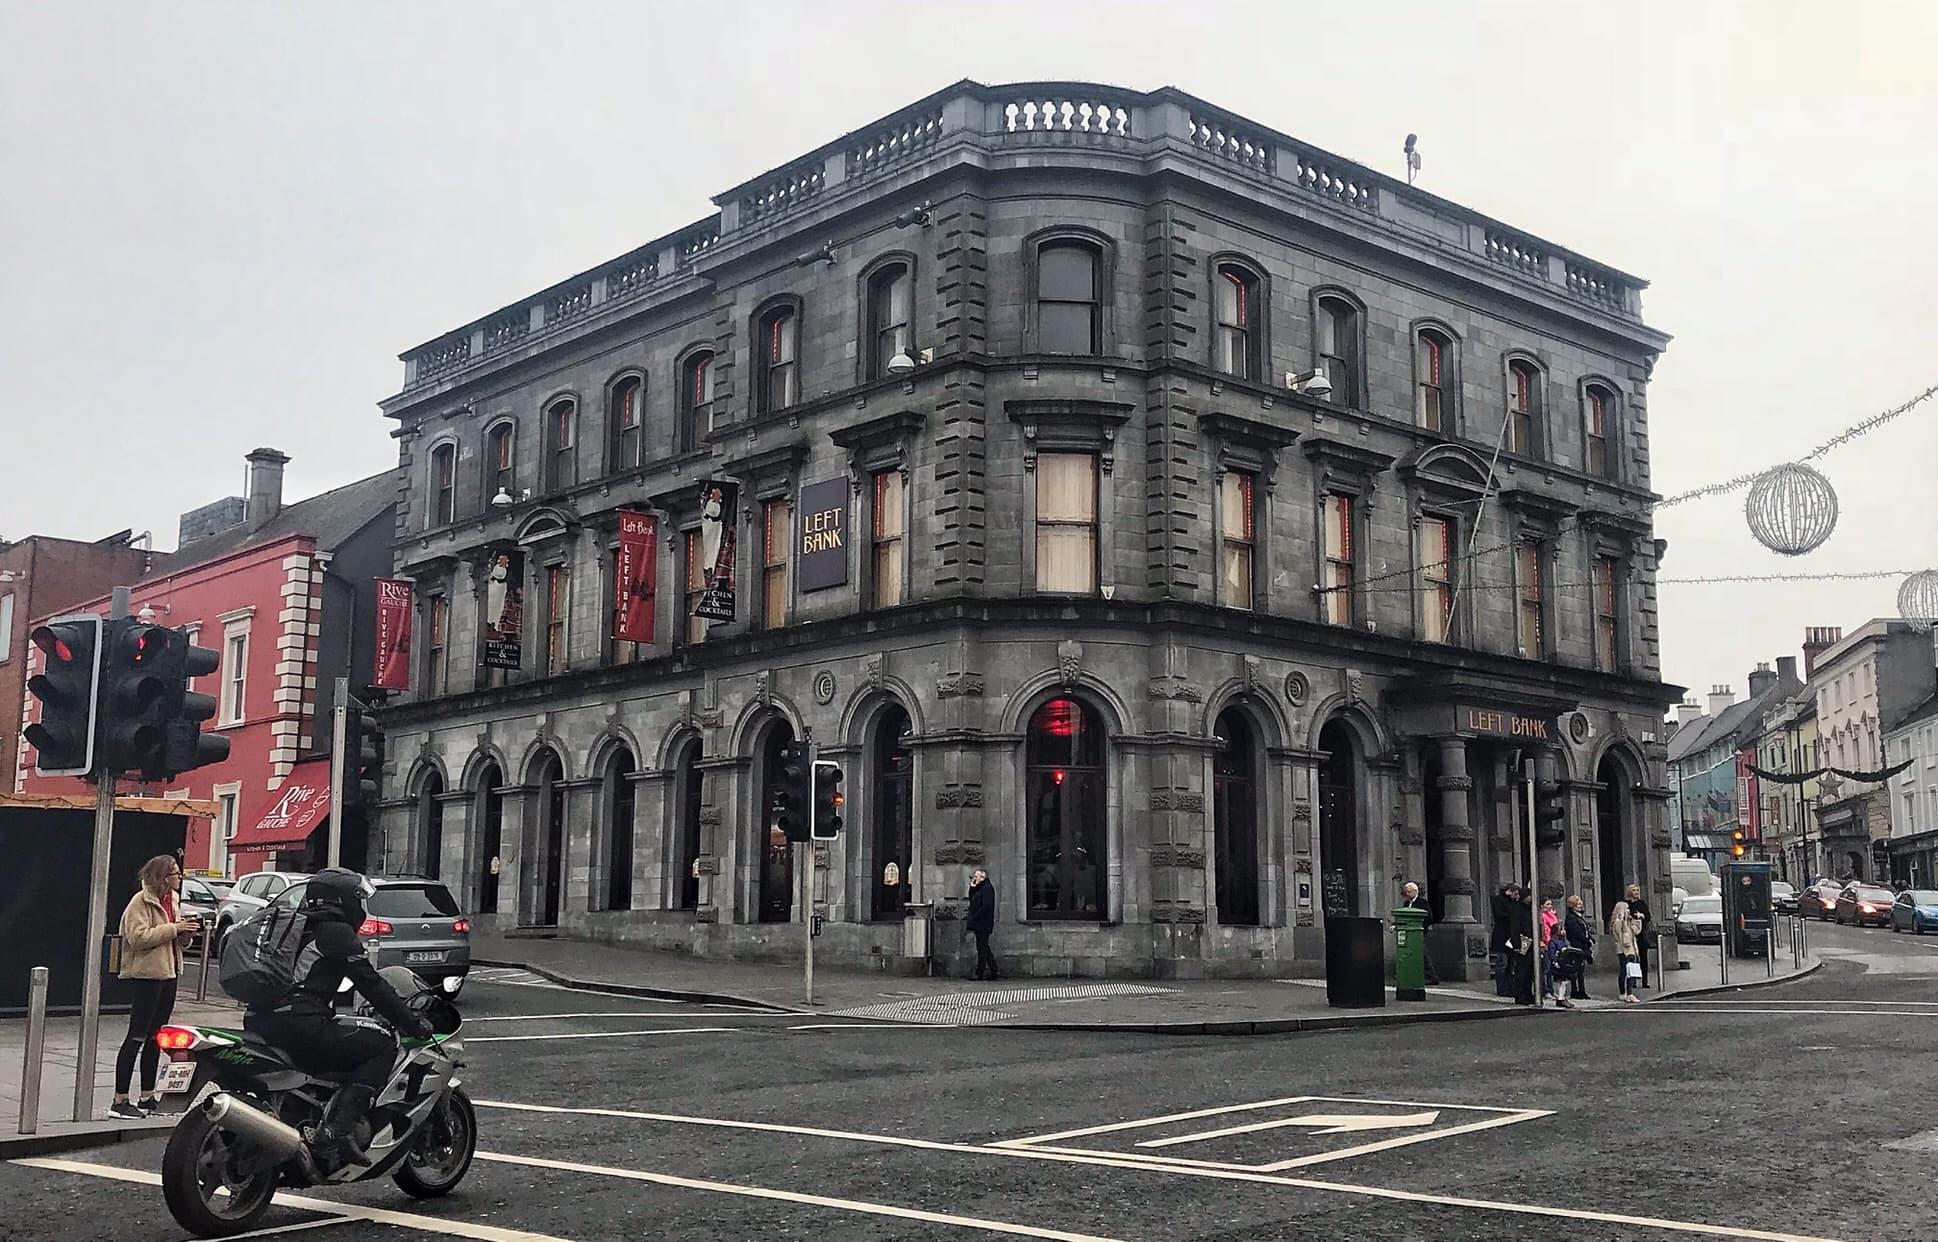 Left Bank, Kilkenny